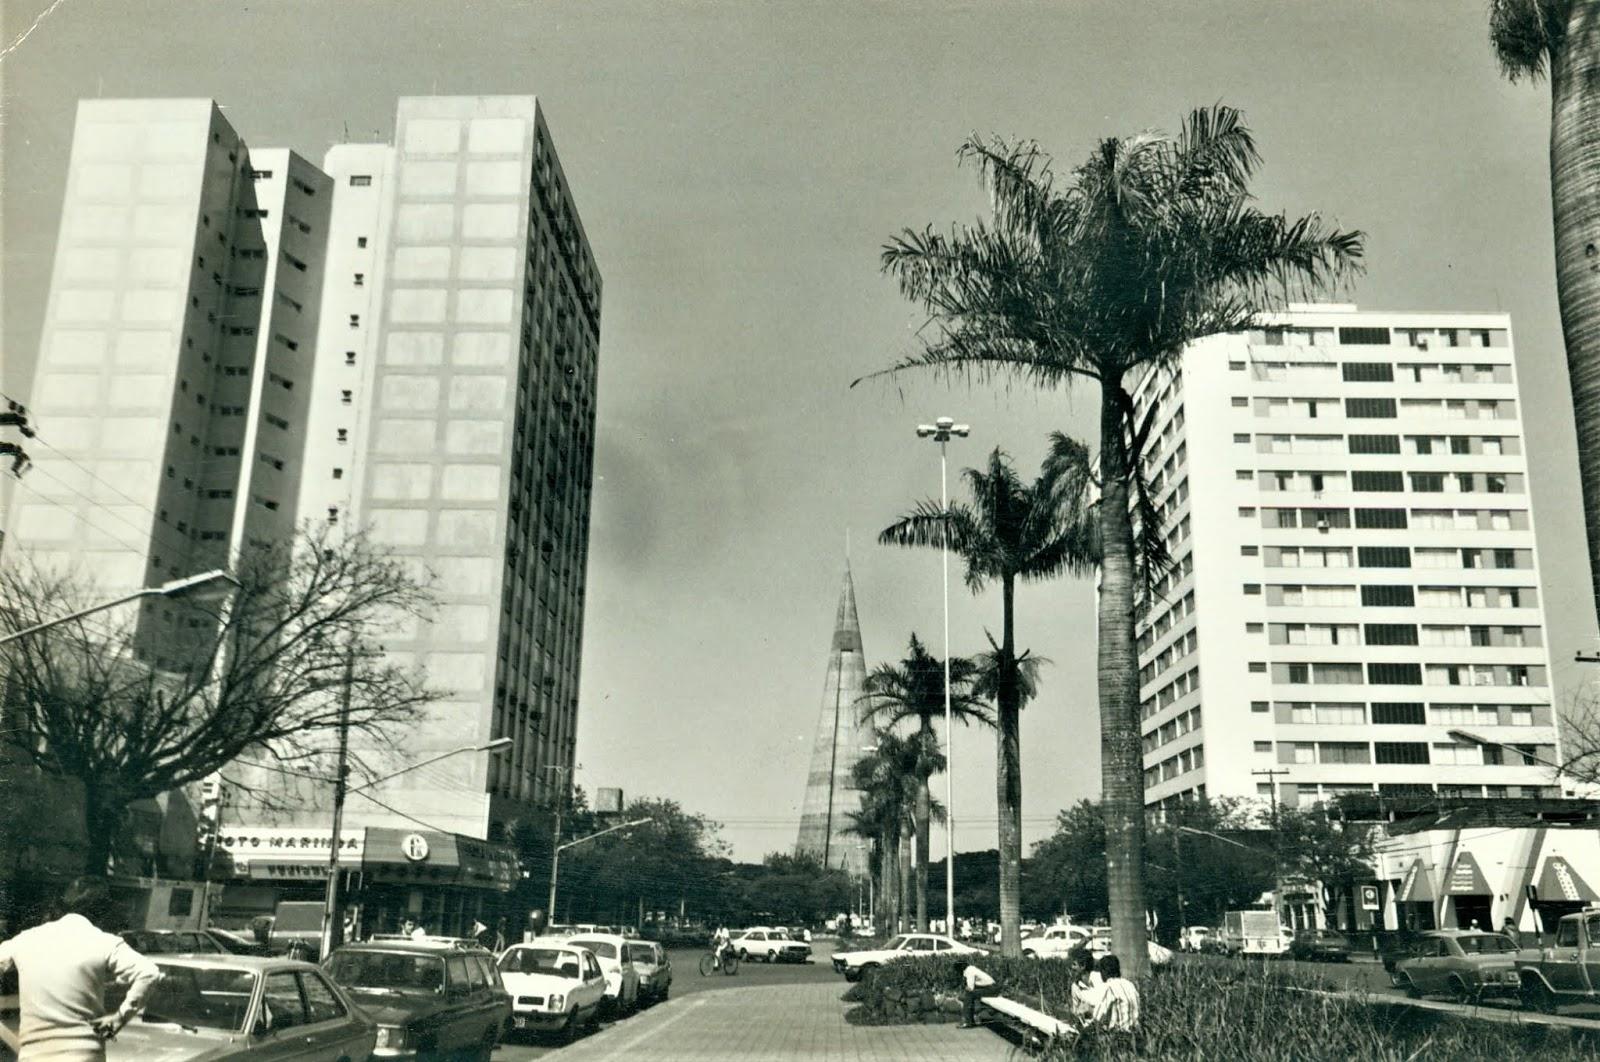 Avenida Getúlio Vargas - 1981